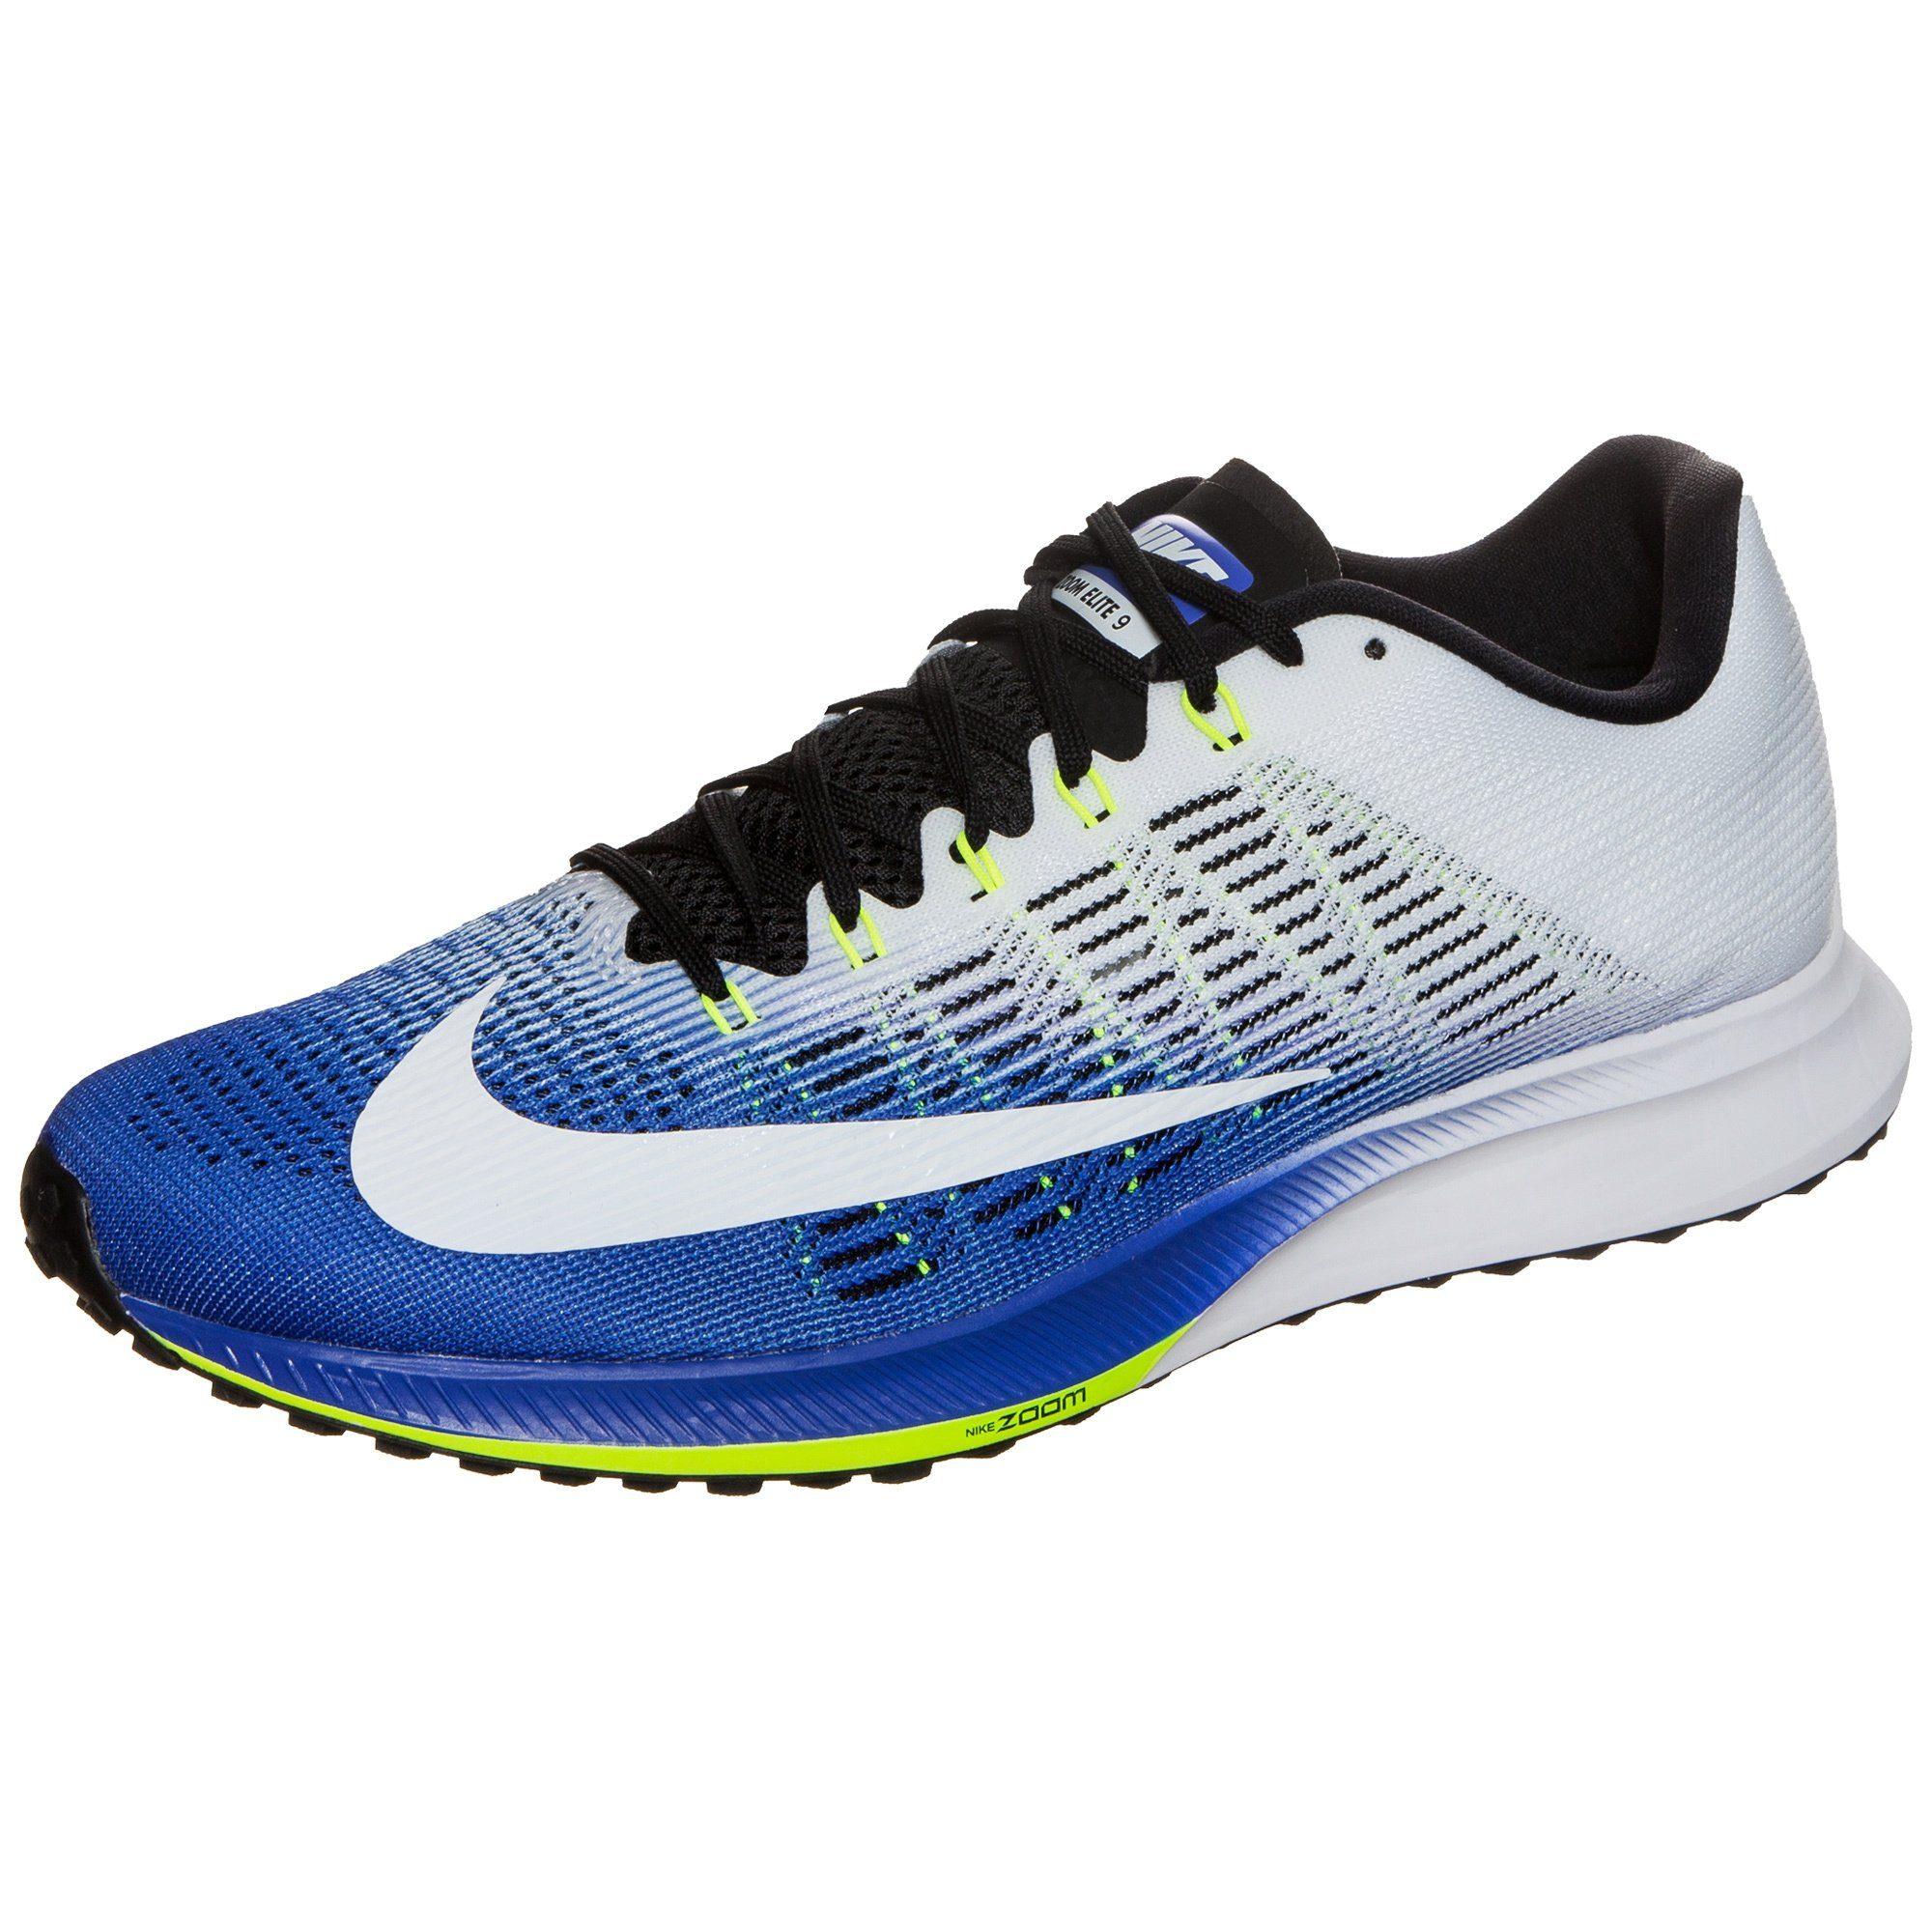 huge selection of 5762c 3cb5e Nike Air Zoom Elite 9 Laufschuh Herren günstig kaufen | BAUR